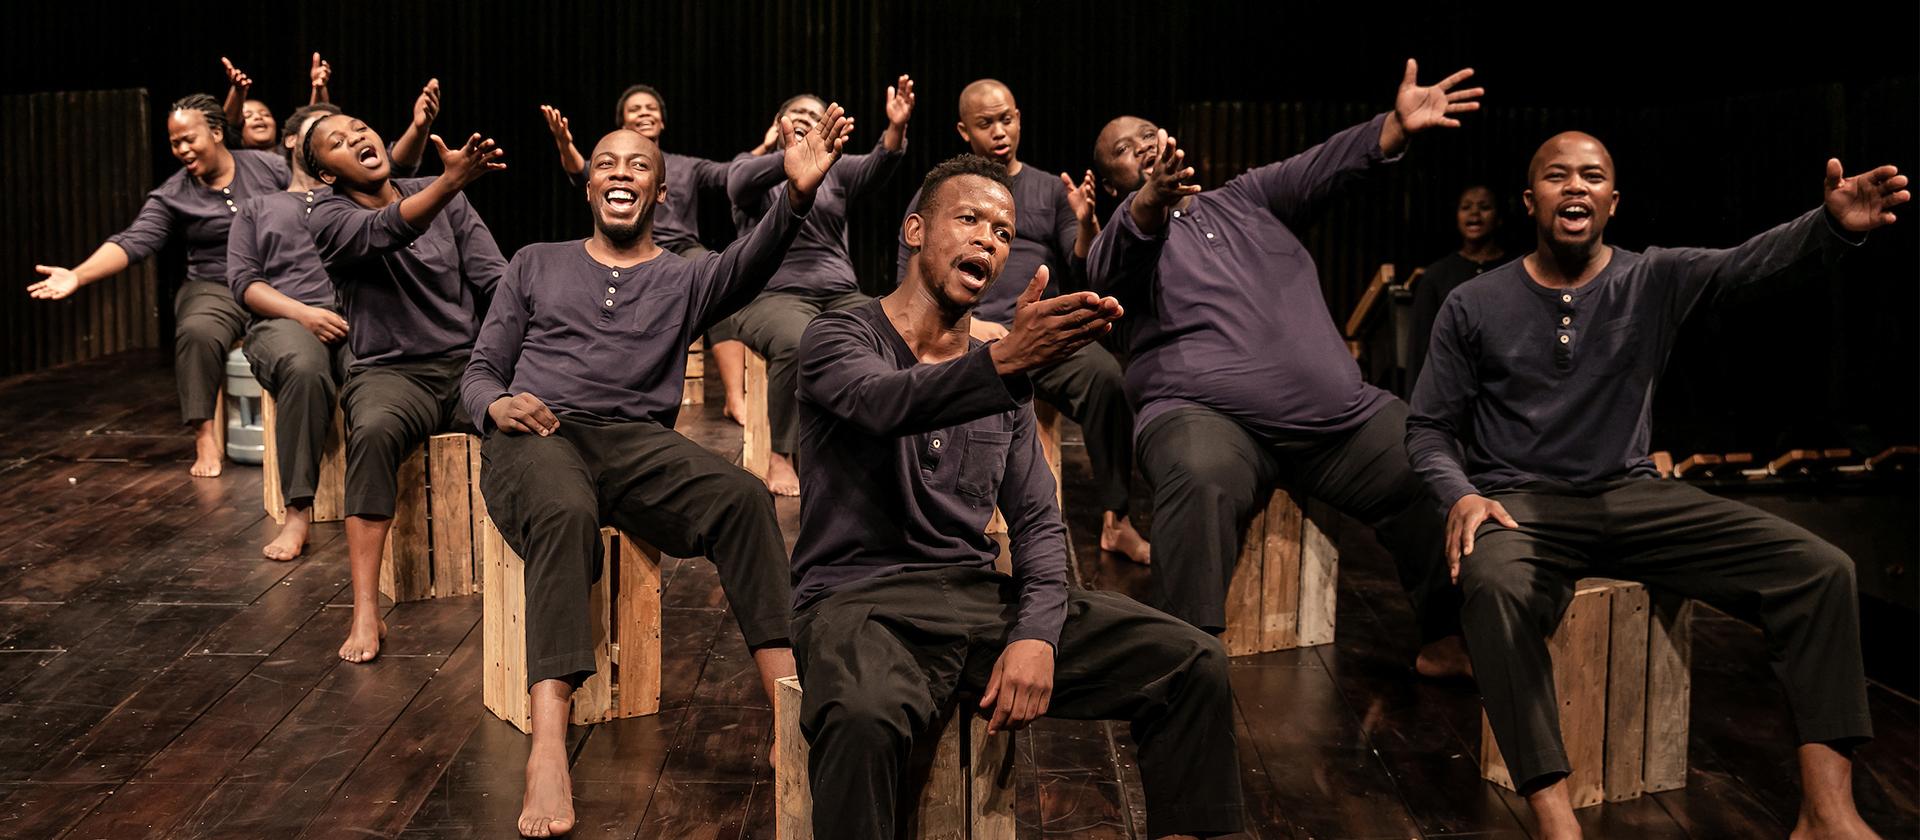 Isango Ensemble – SS Mendi: Dancing the Death Drill